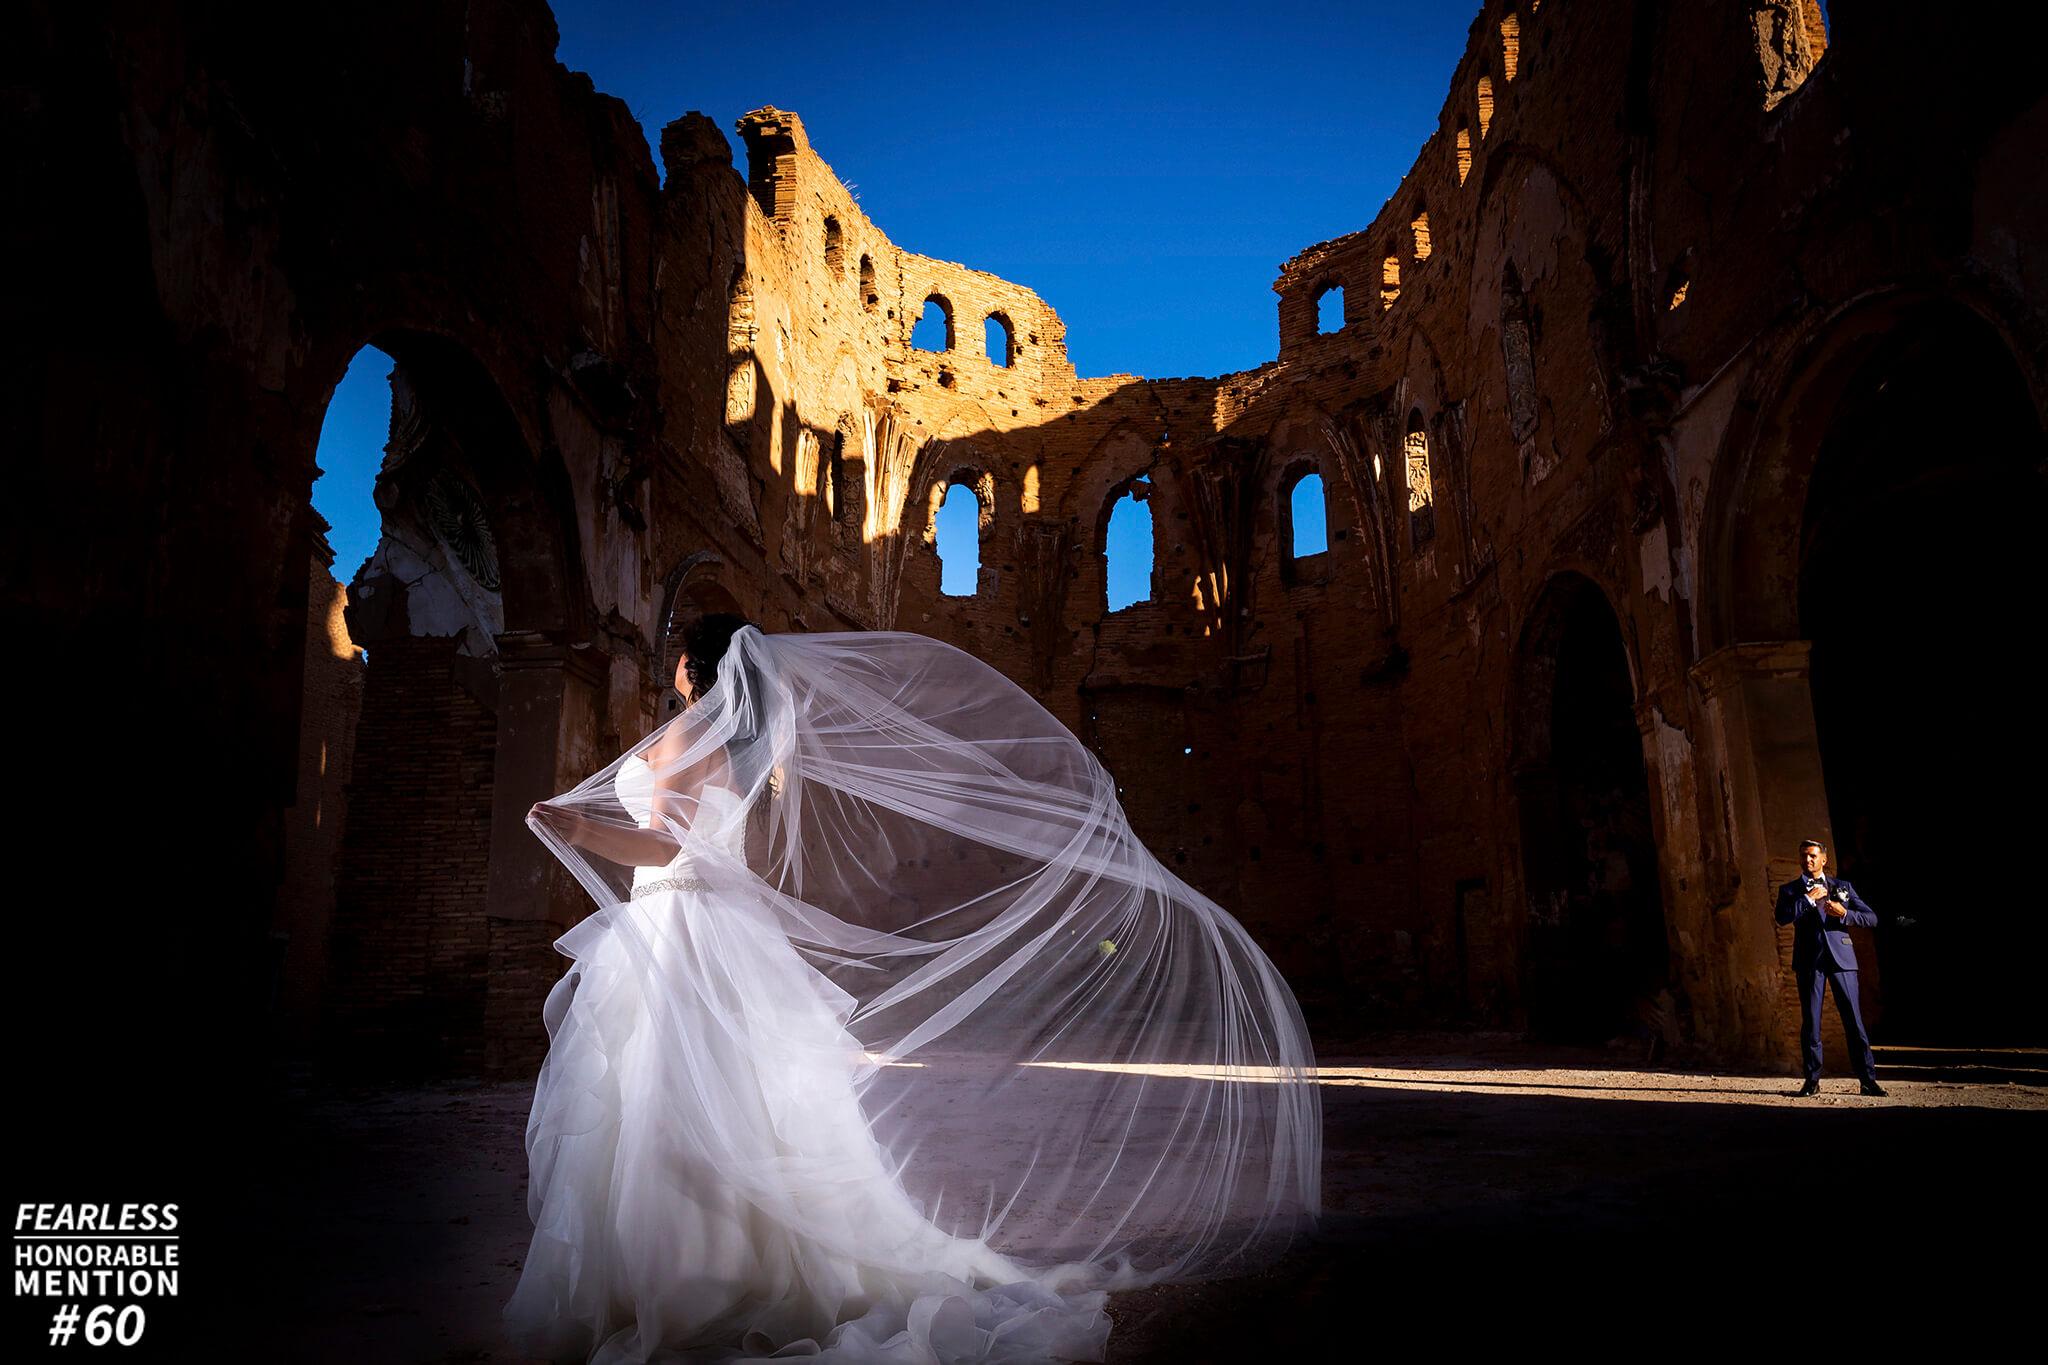 David Delgado Wedding Photography – Fearless Honorable Mention Collection 60